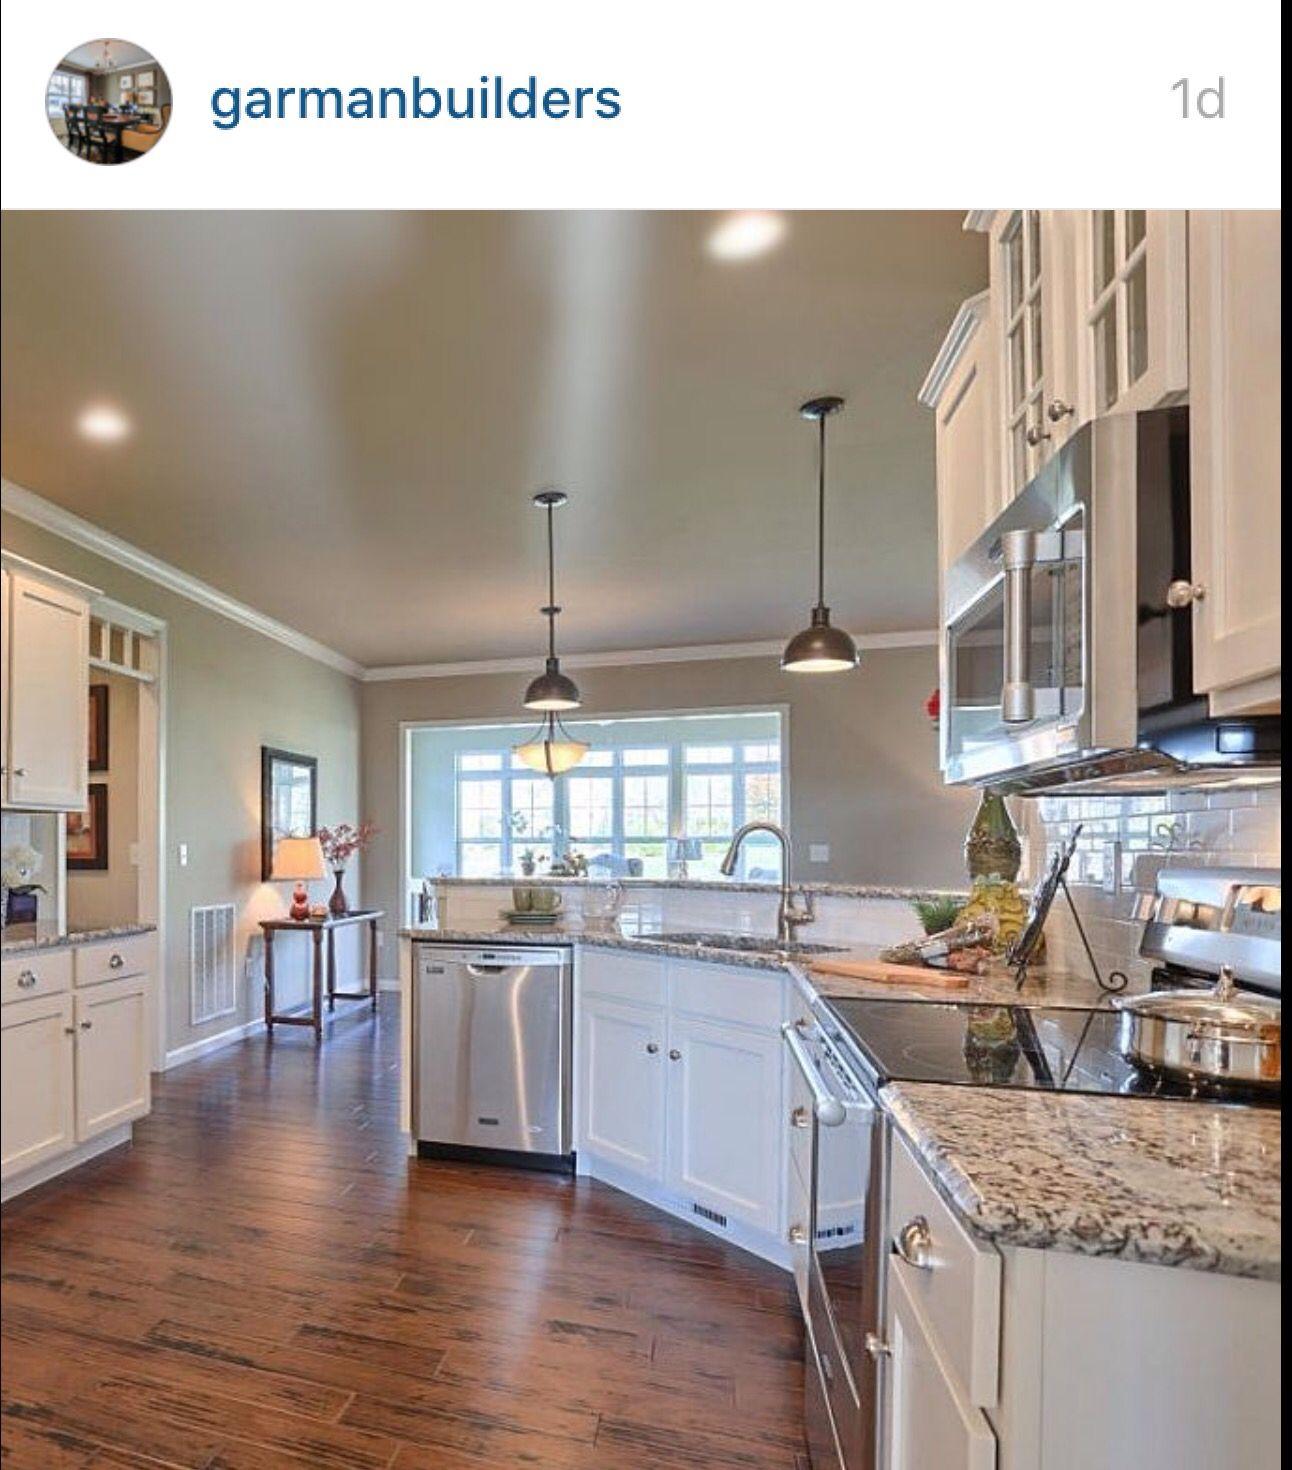 I love this kitchen!!! Open airy, white grey